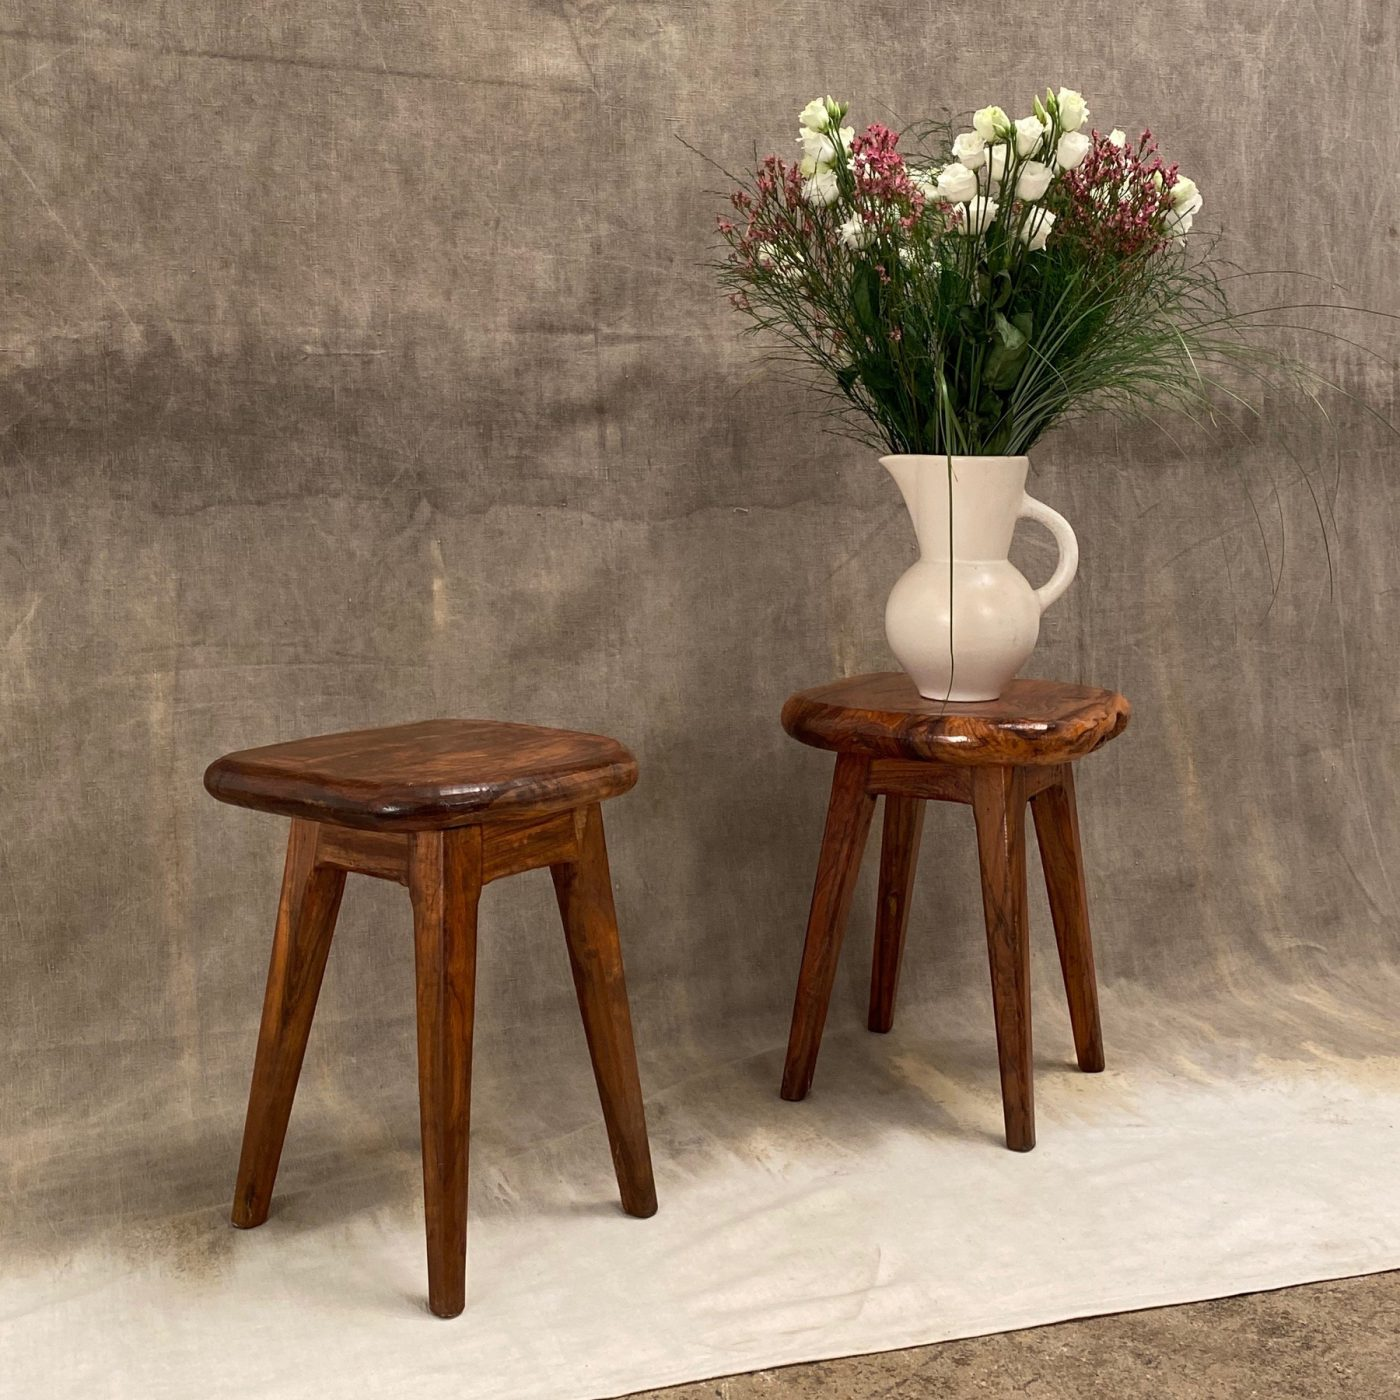 primitive-olive-stools0004